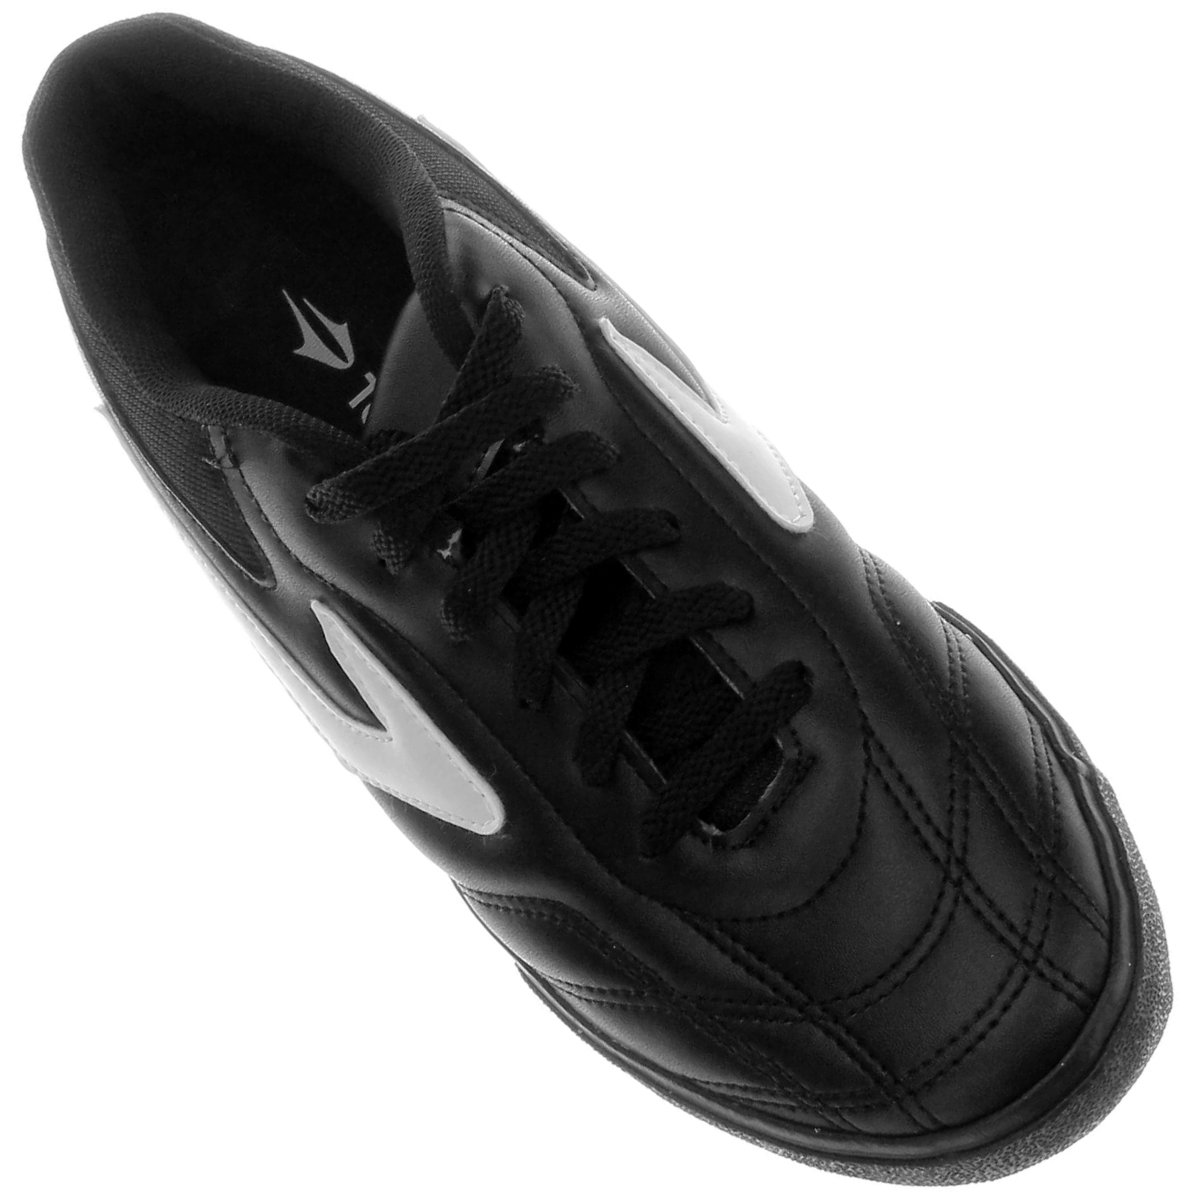 Topper Preto Dominator 3 Chuteira e Masculina Futsal Chuteira Futsal Dominator Branco Topper 3 Hw5vqHY